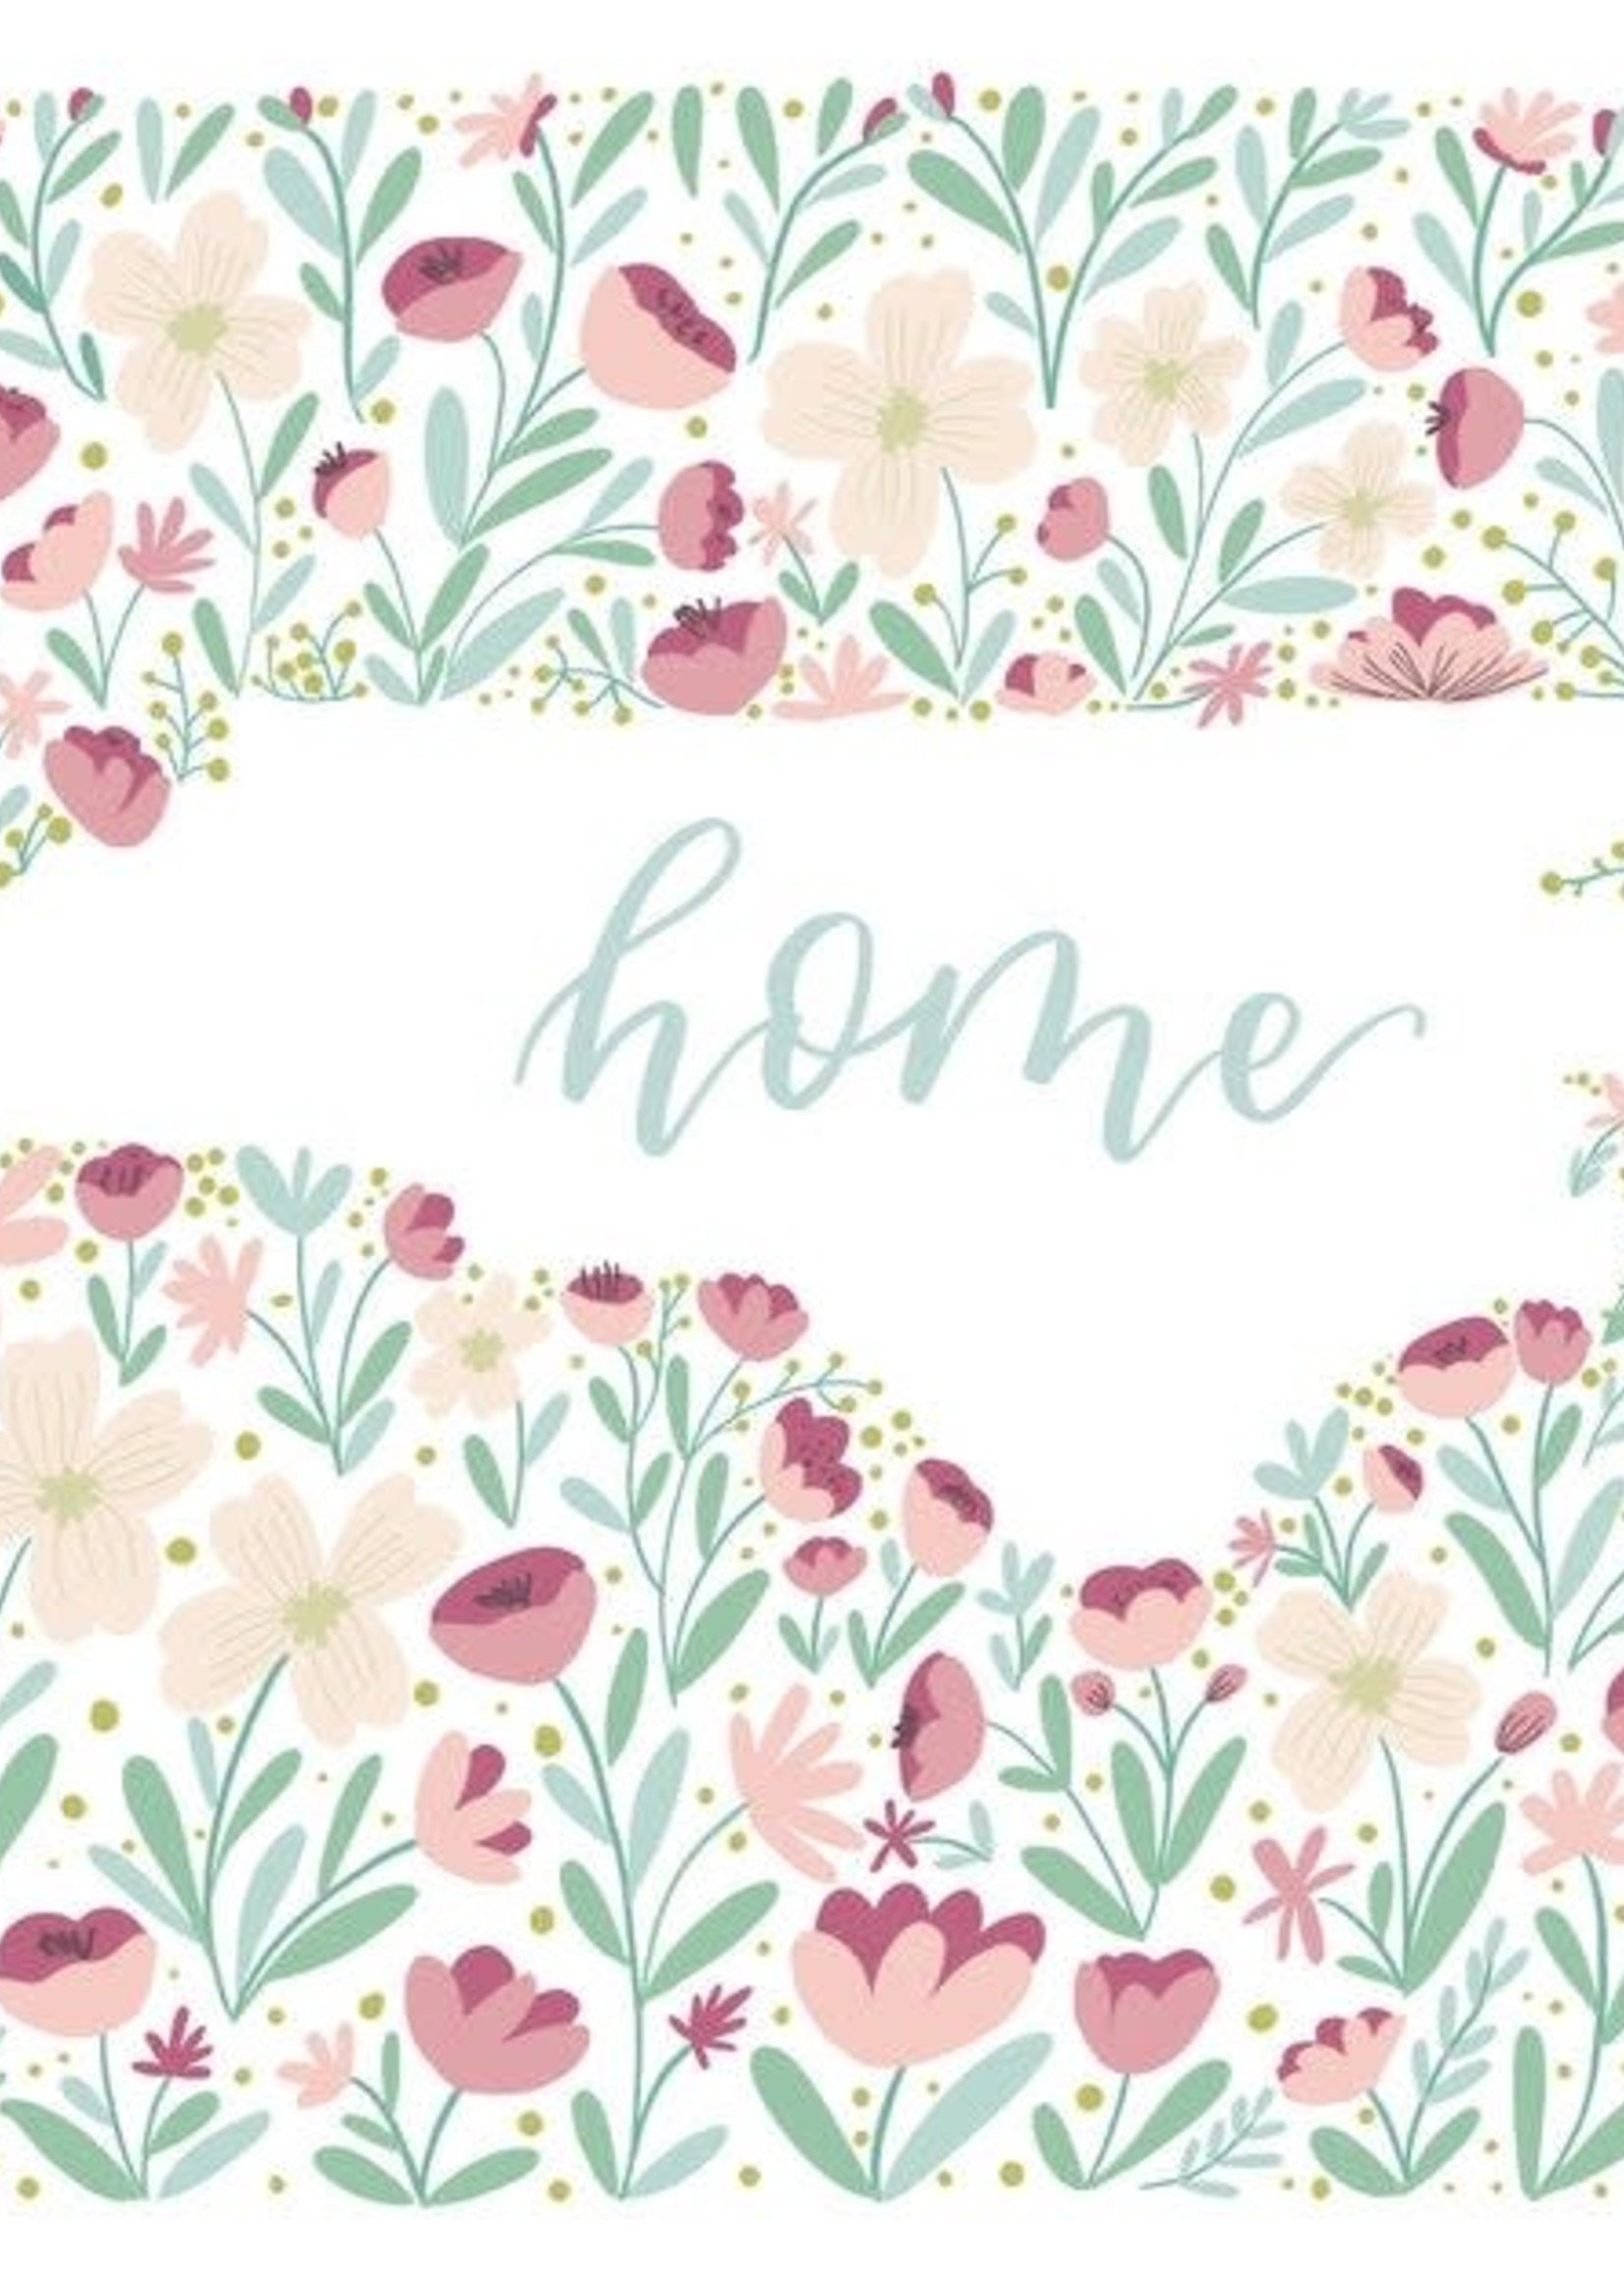 Happy Tines Happy Tines NC Home Print 5x7